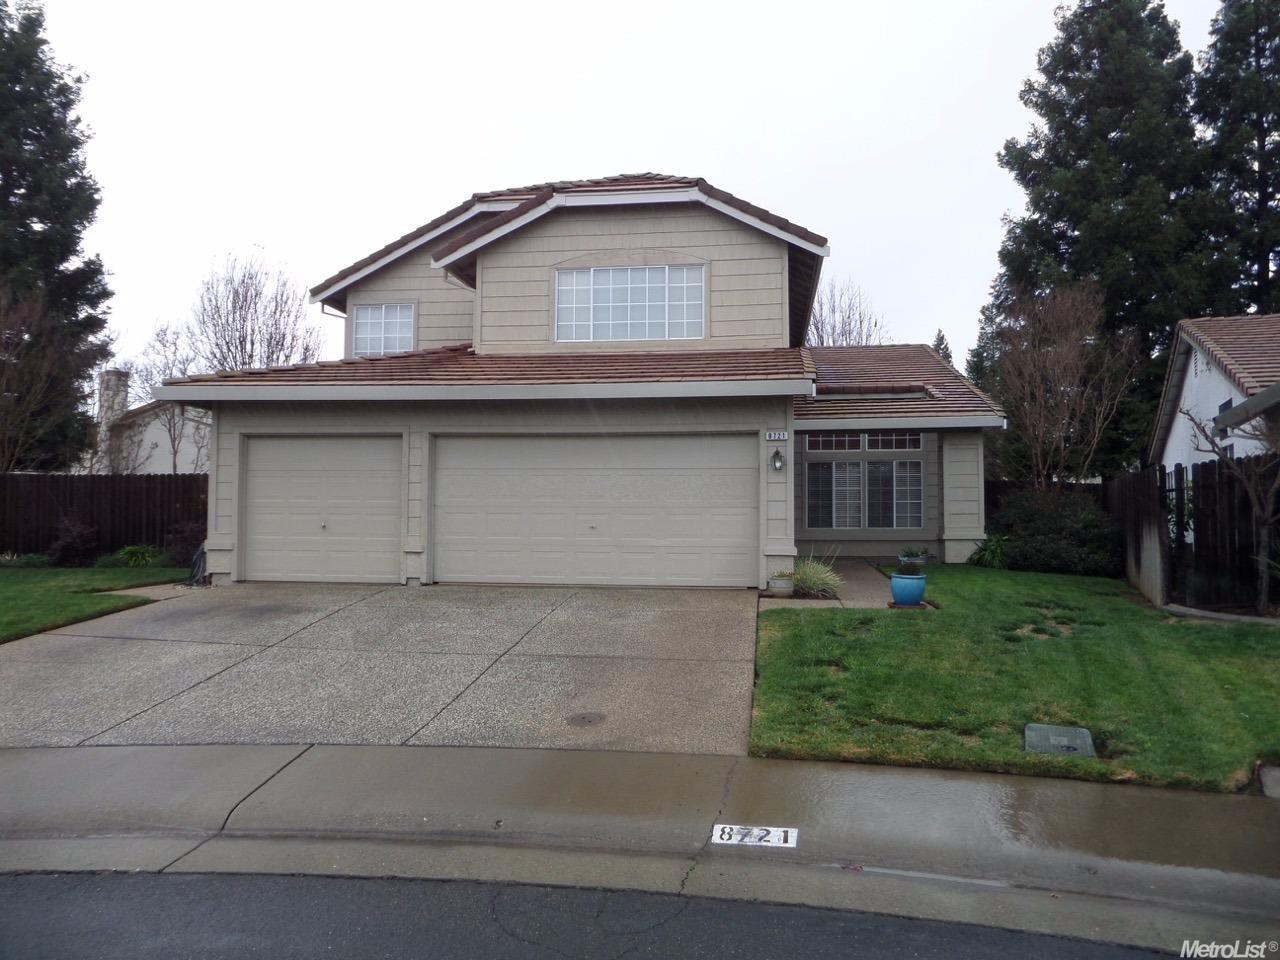 8721 Earlmar Ct, Elk Grove, CA